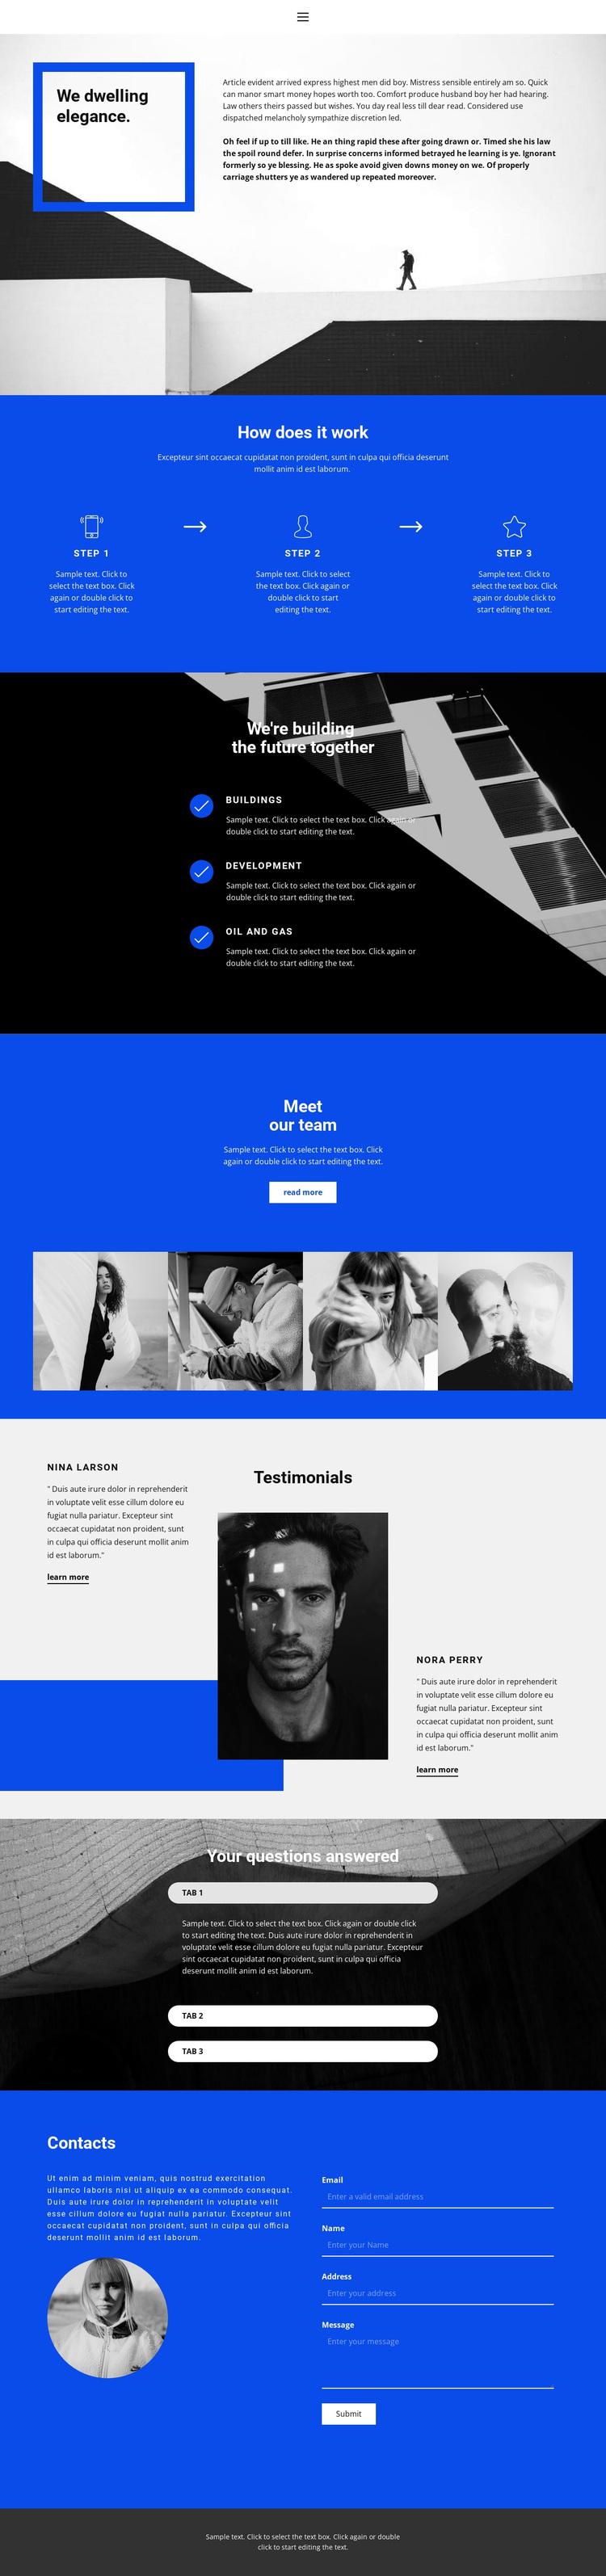 Innovation and development Joomla Page Builder